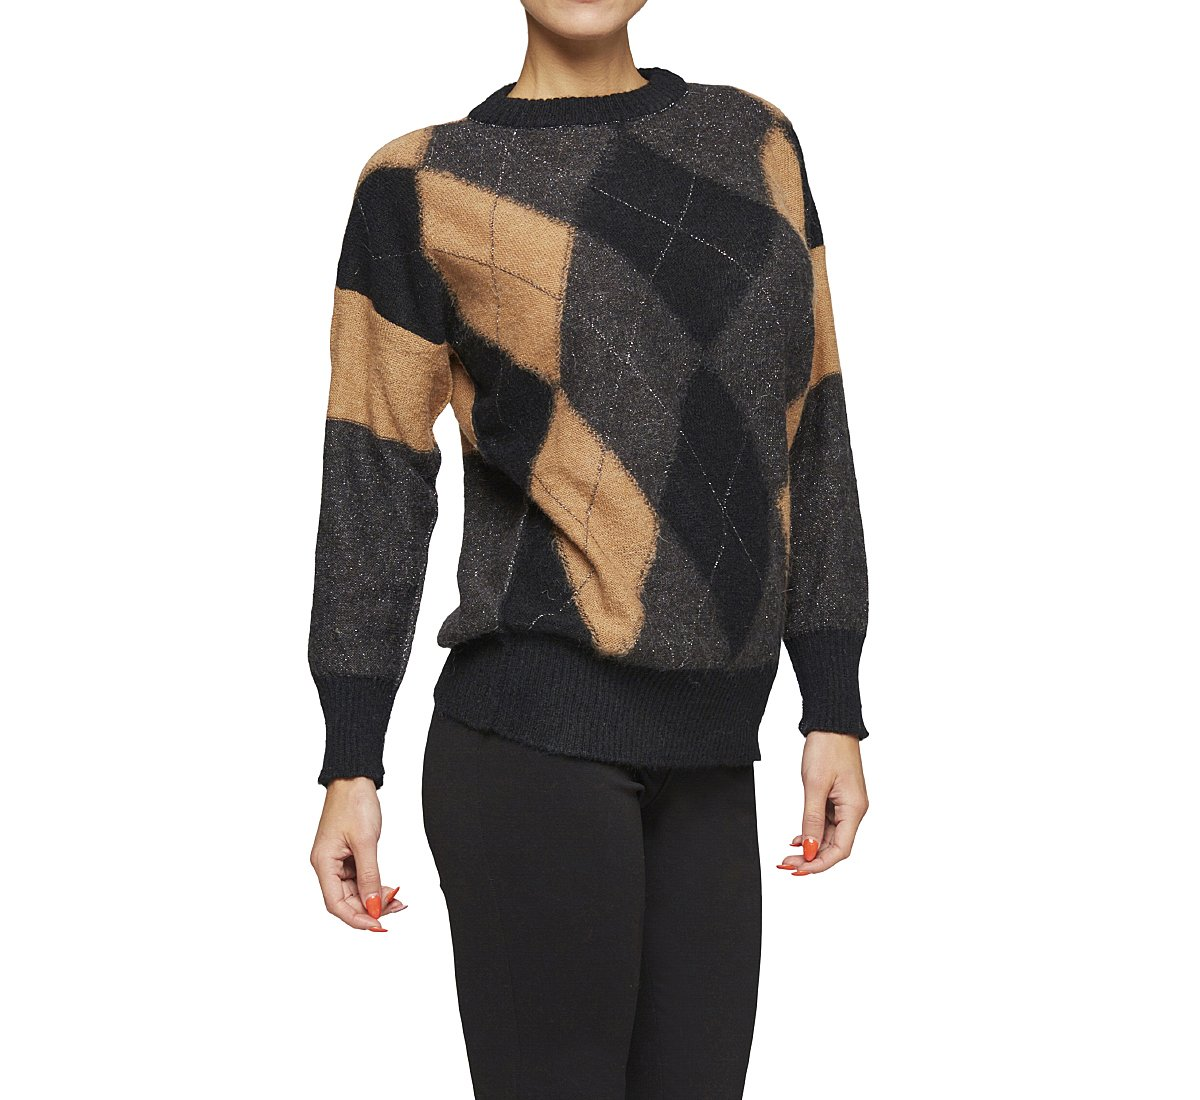 Maglioncino a fantasia in tessuto e lana